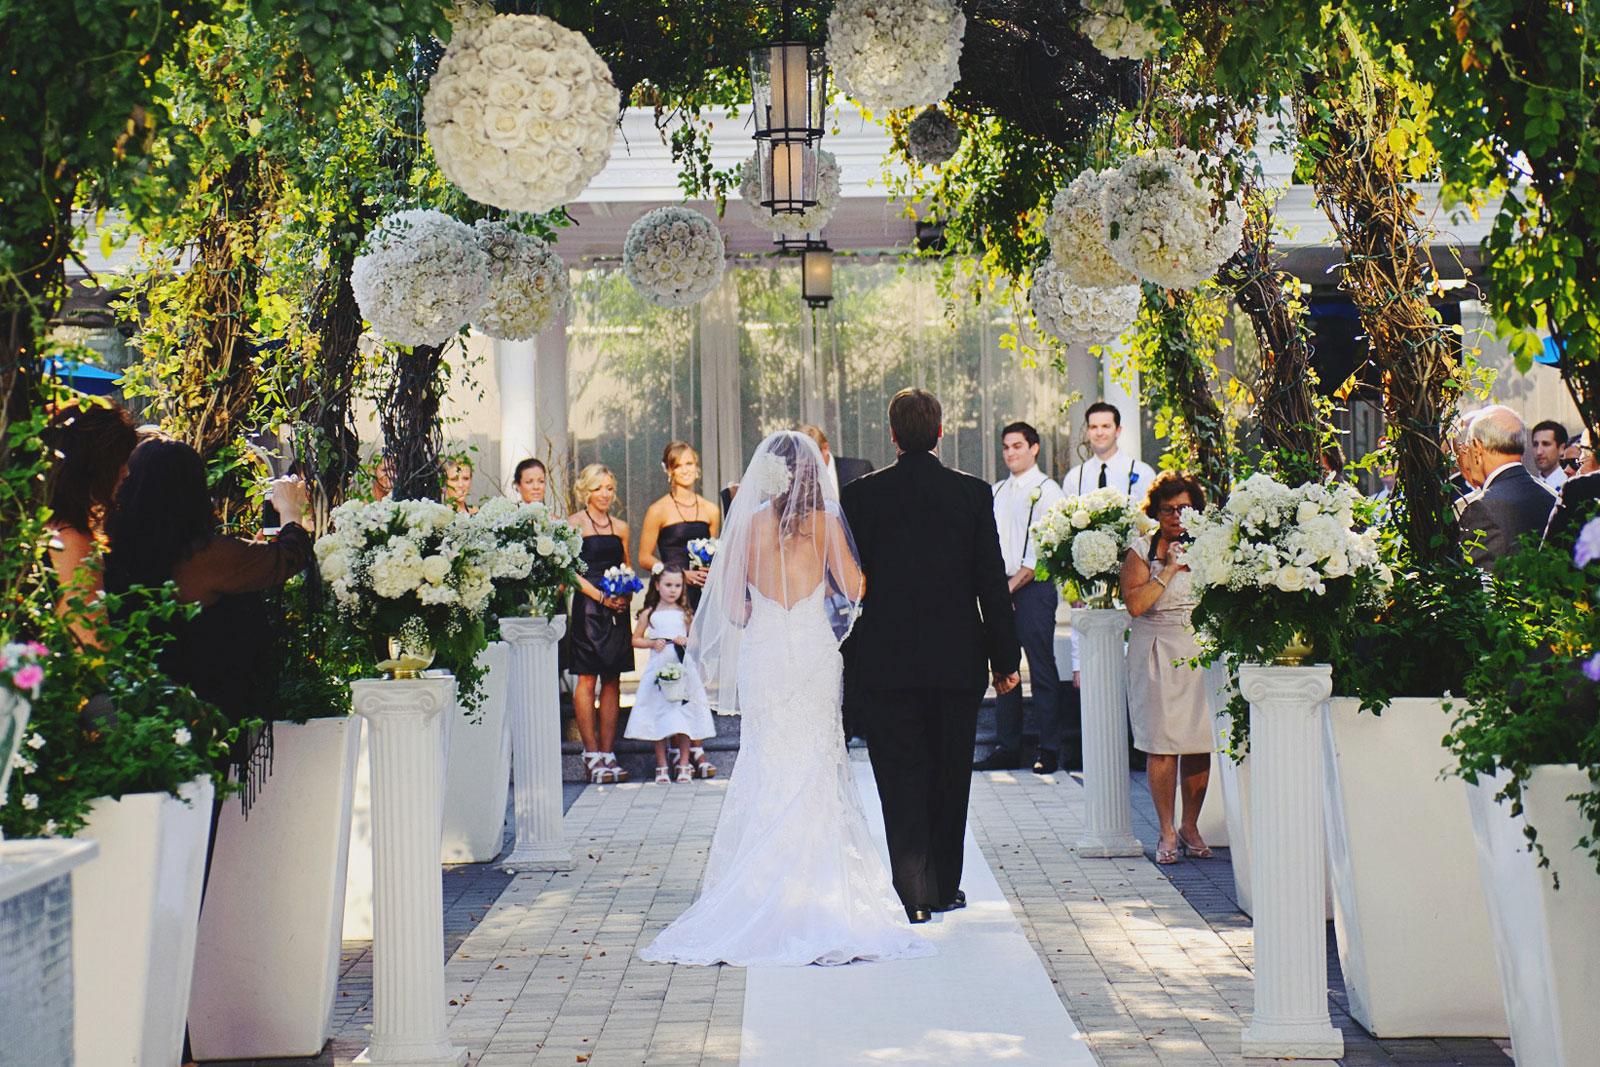 Chateau Briand Garden Wedding Aisle